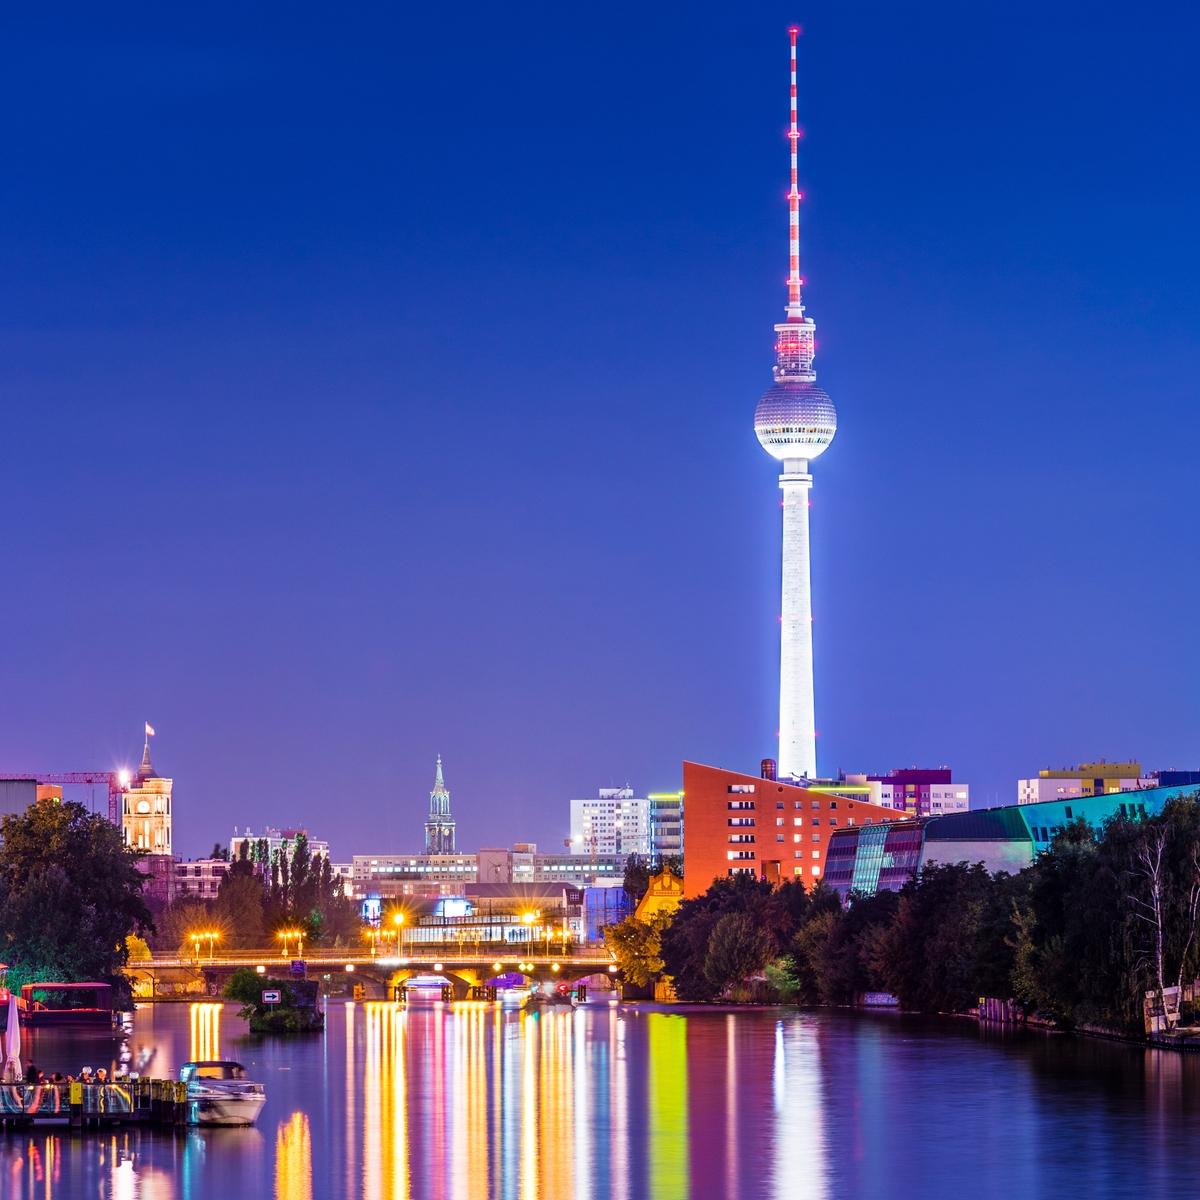 O Πύργος της Τηλεόρασης στην Alexanderplatz του Βερολίνου τη νύχτα - ταξίδι το Πάσχα στην Ευρώπη